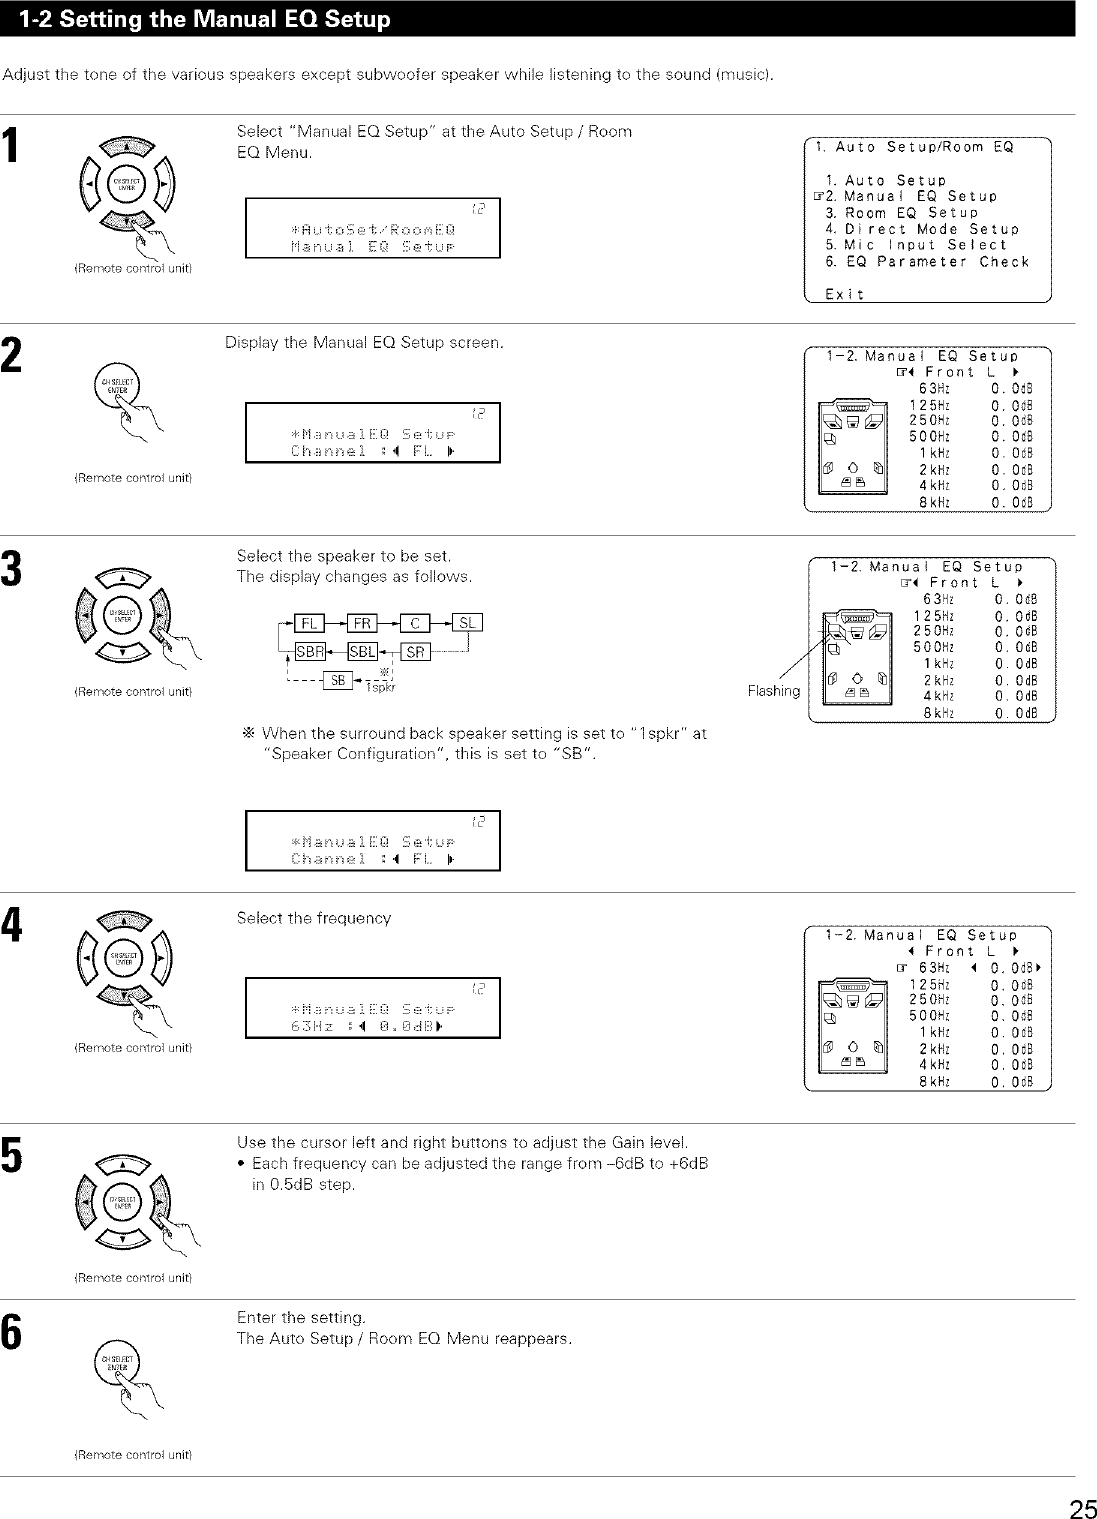 Denon AVR 2805 User Manual AV SURROUND RECEIVER Manuals And